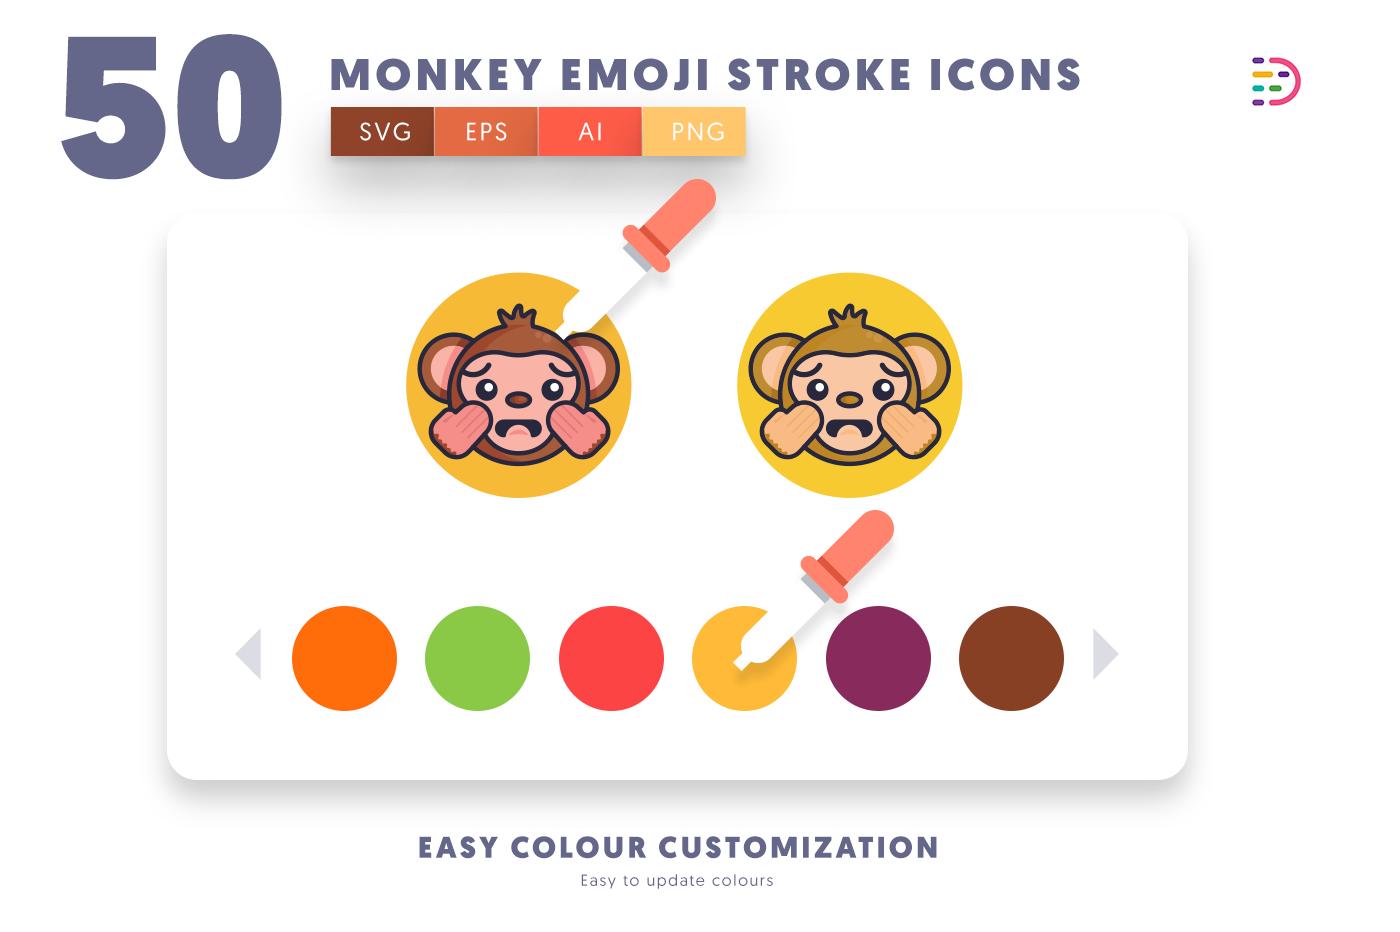 Customizable and vector 50 Monkey Emoji Stroke Icons